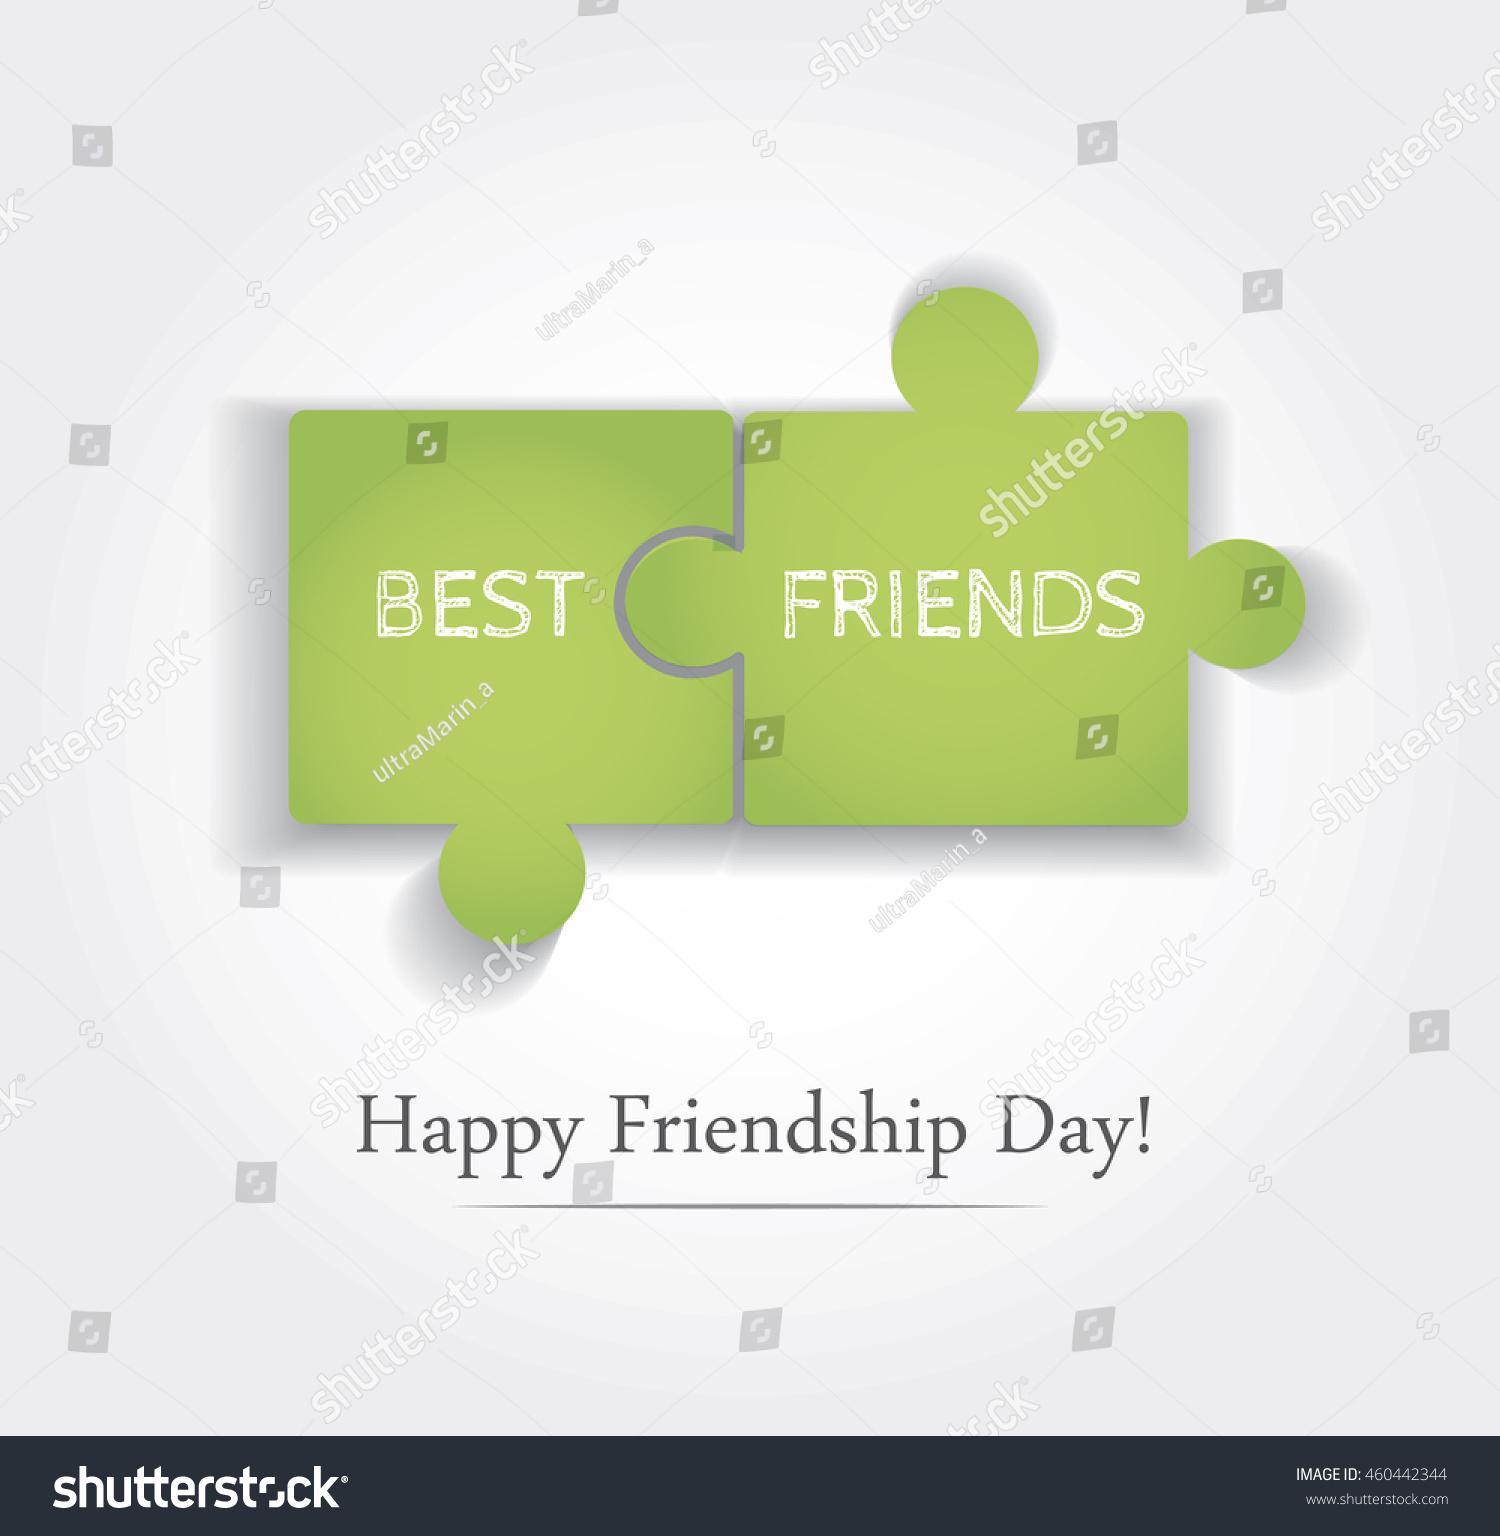 Vector Illustration Friendship Day Best Friends Stock Vector